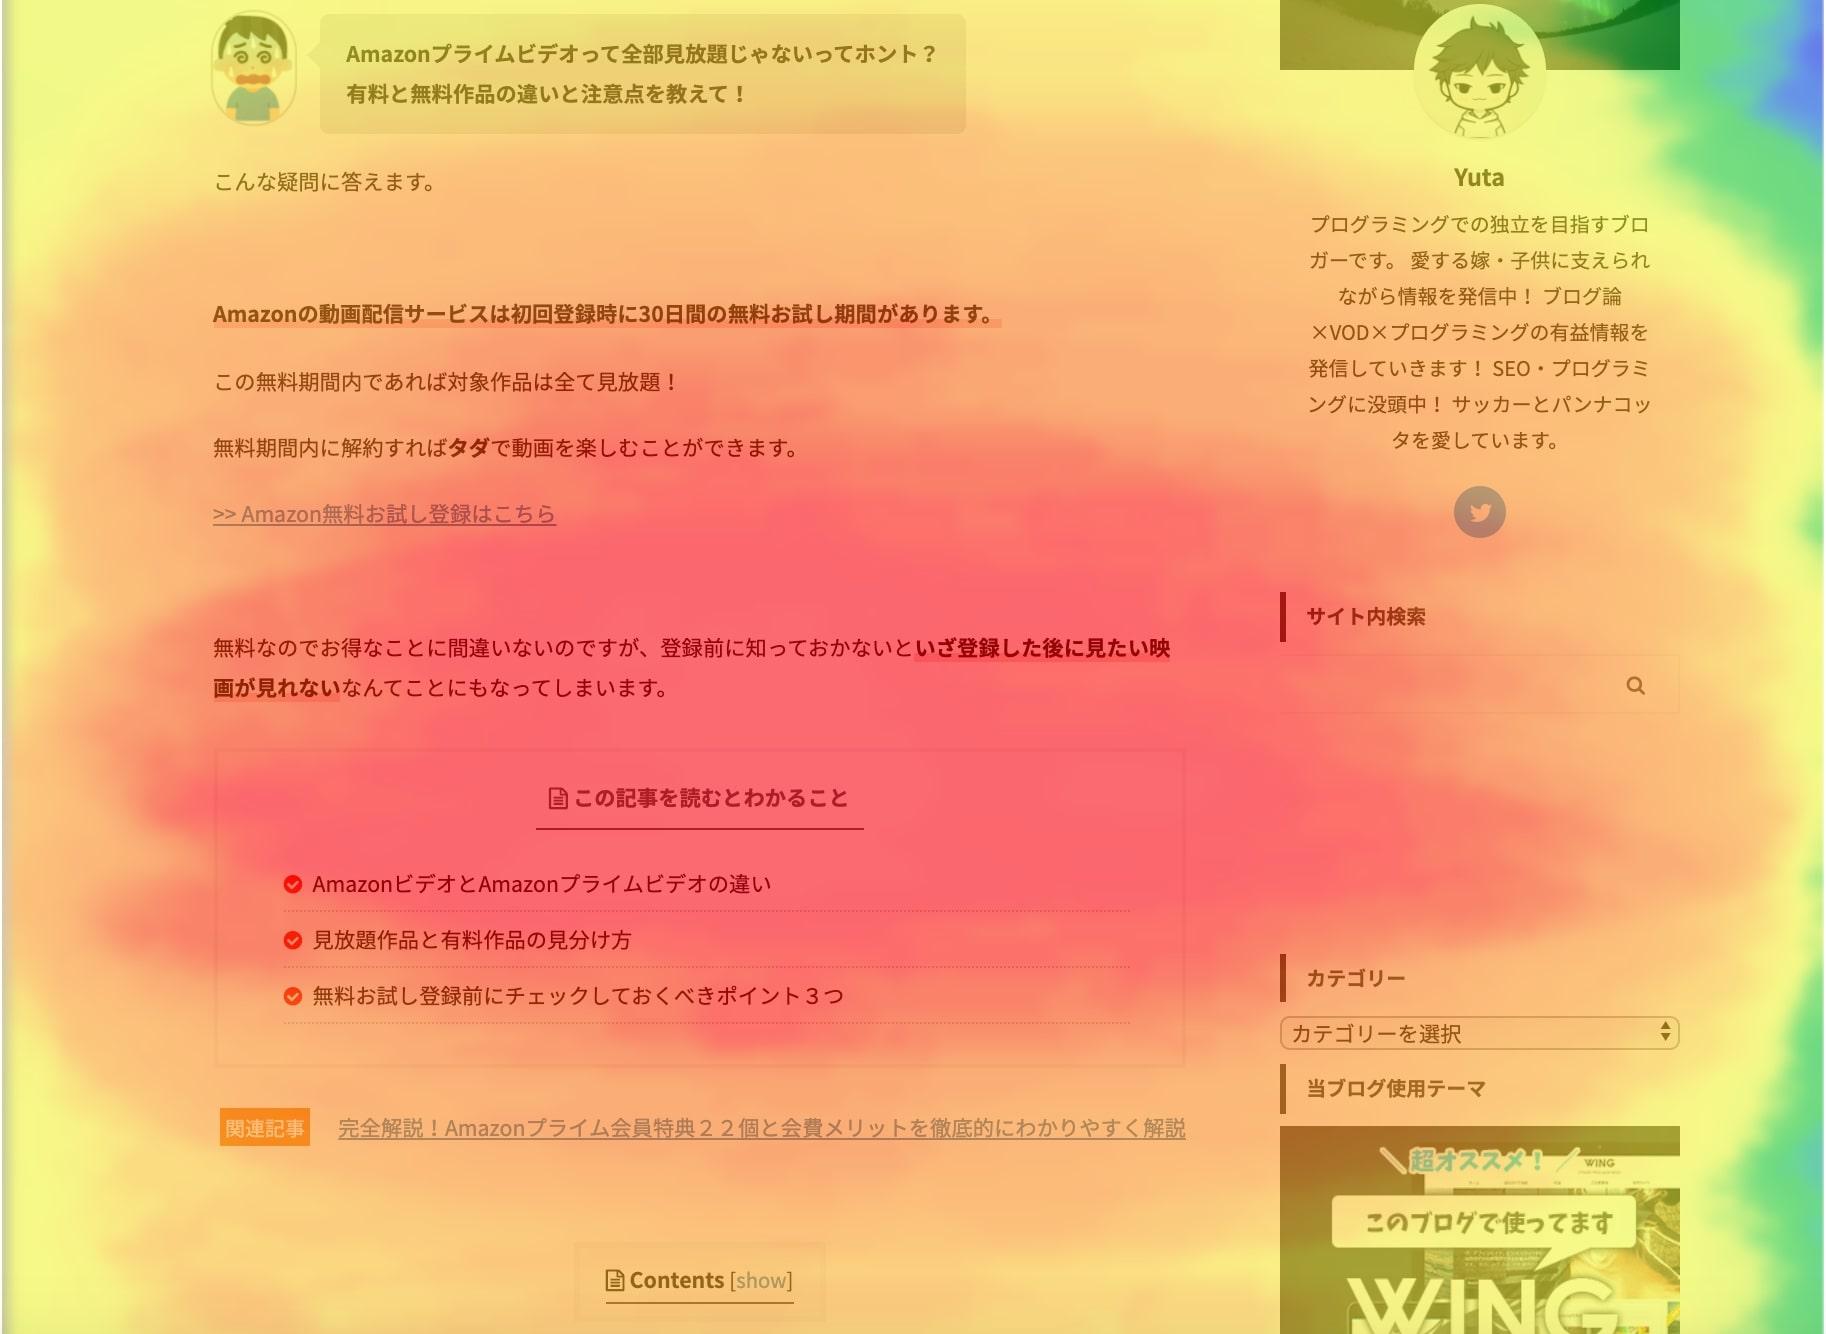 UserHeat(熟読)